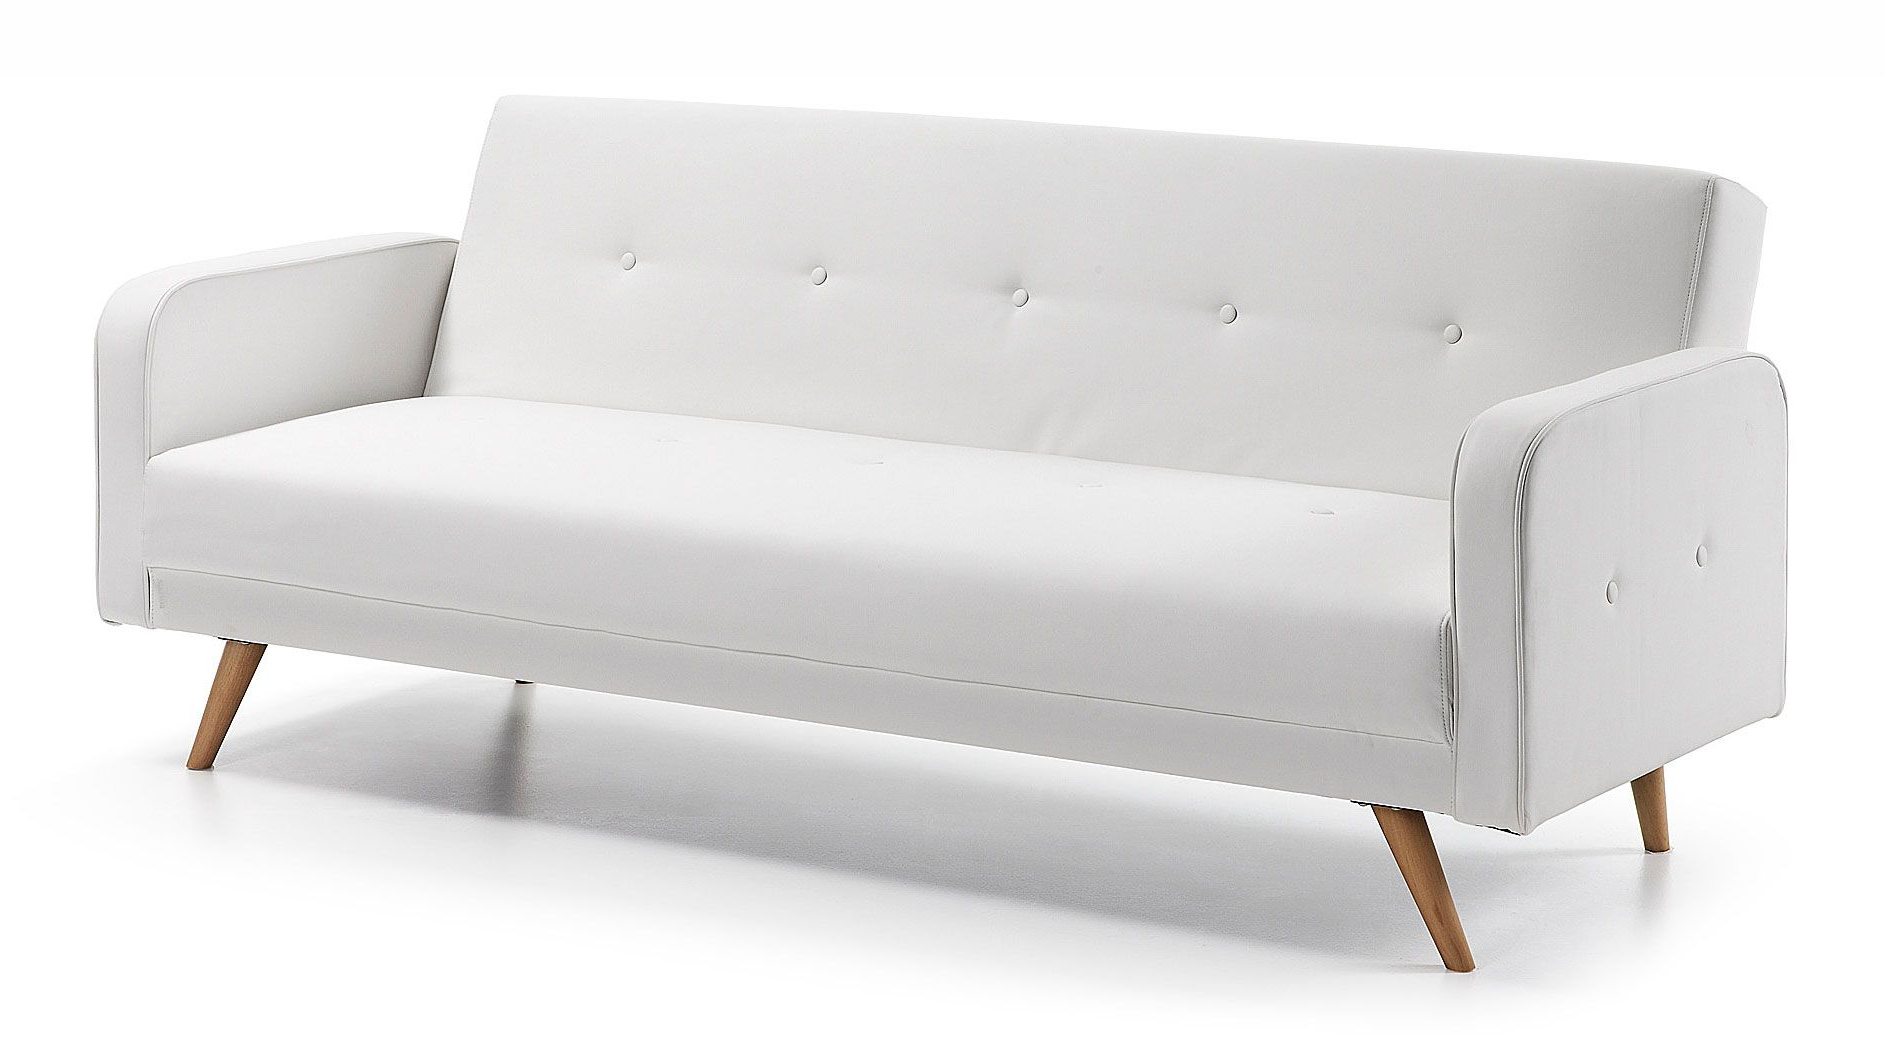 Sofa Cama Blanco Q0d4 sofà Cama Retro Blanco Roger Decoracià N Pinterest Ph